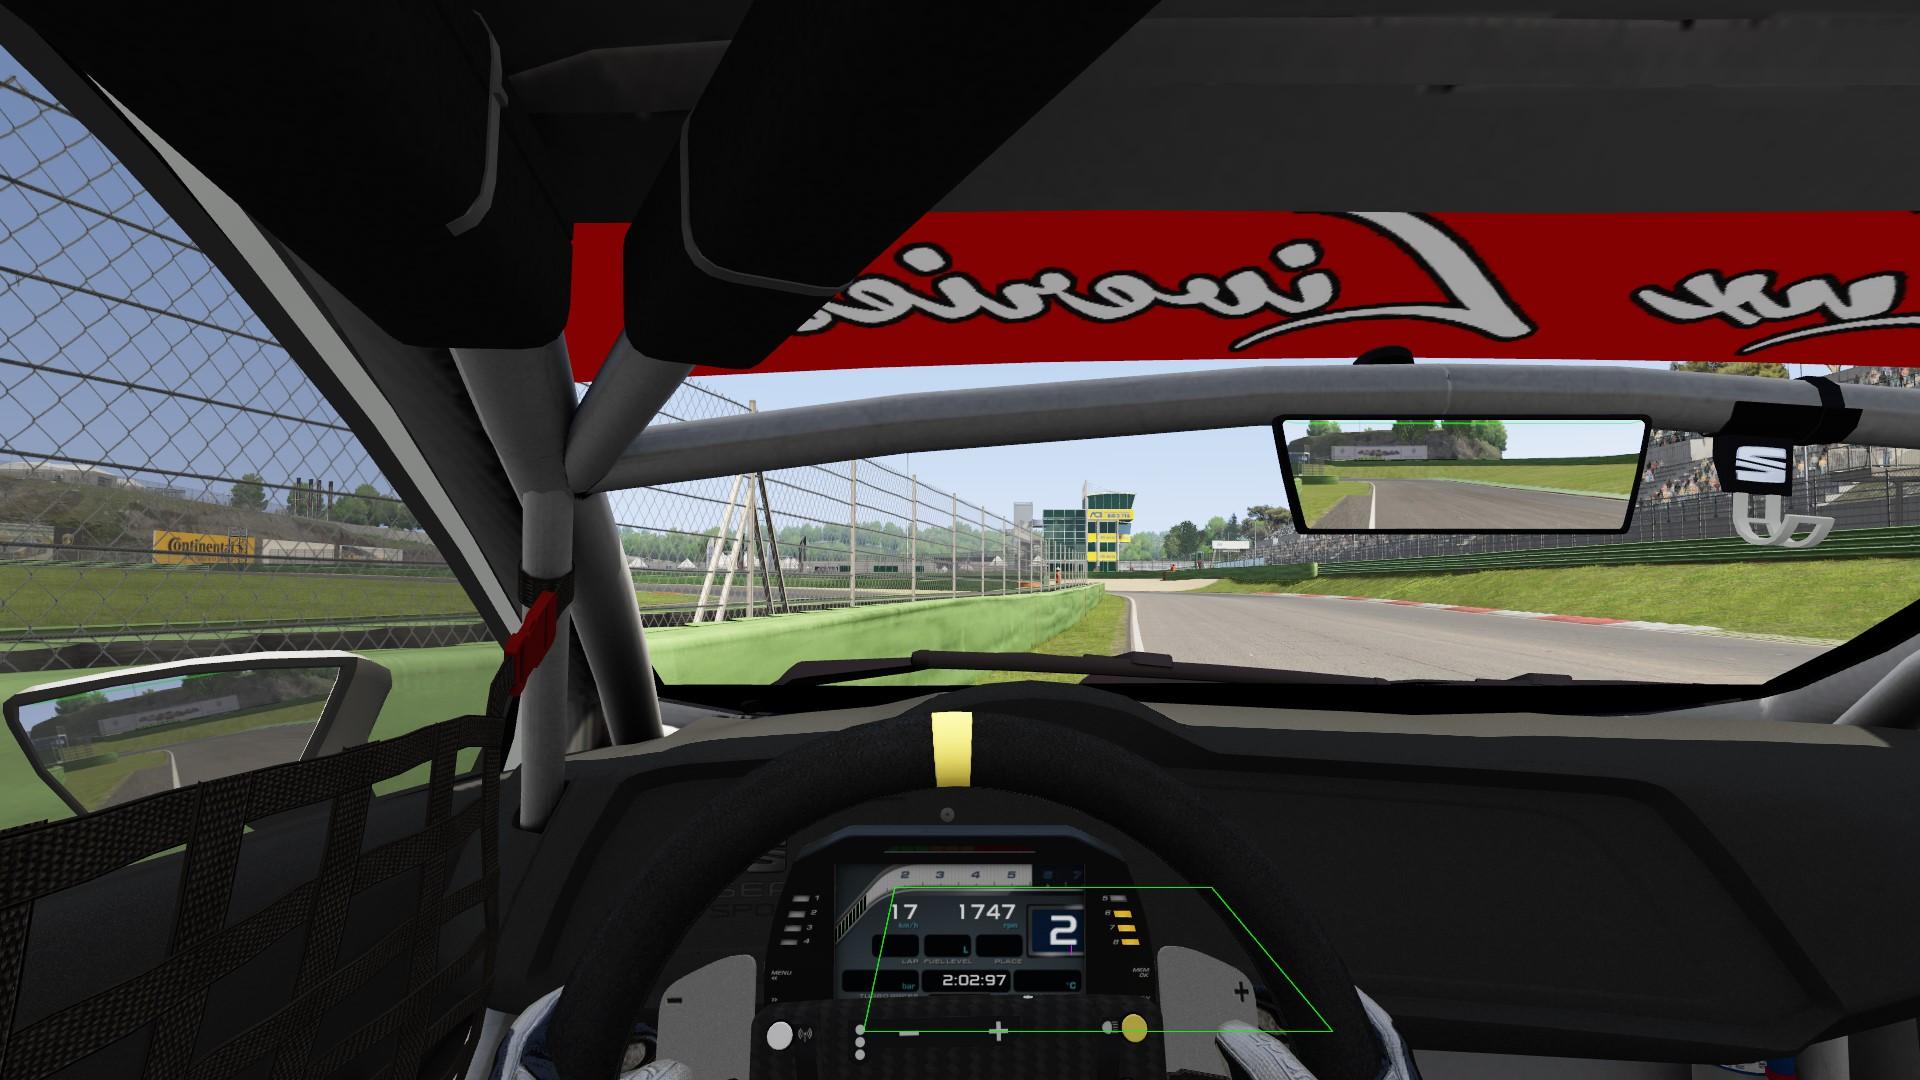 Screenshot_seat_leon_cup_ks_vallelunga_27-4-117-20-9-0.jpg